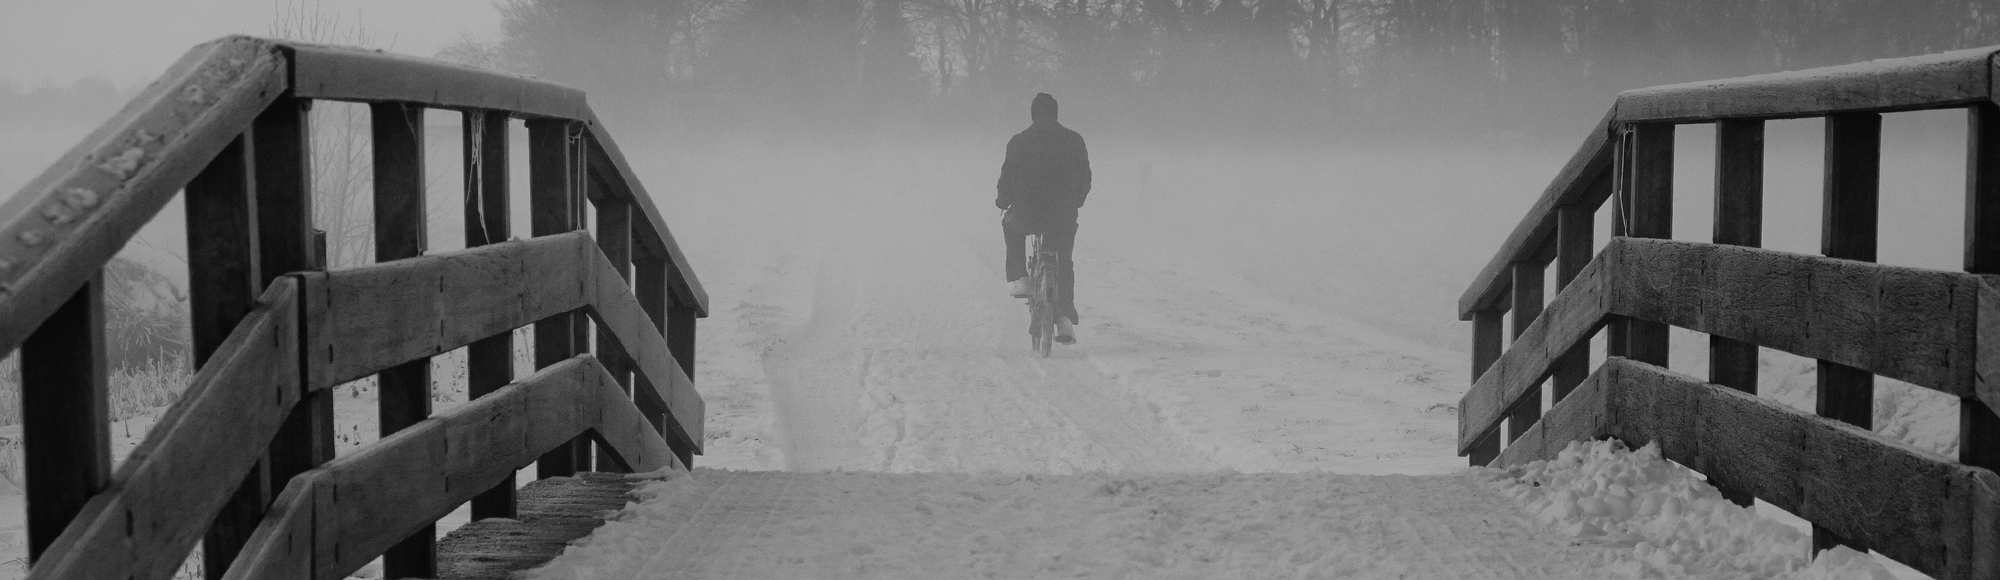 WinterCycling